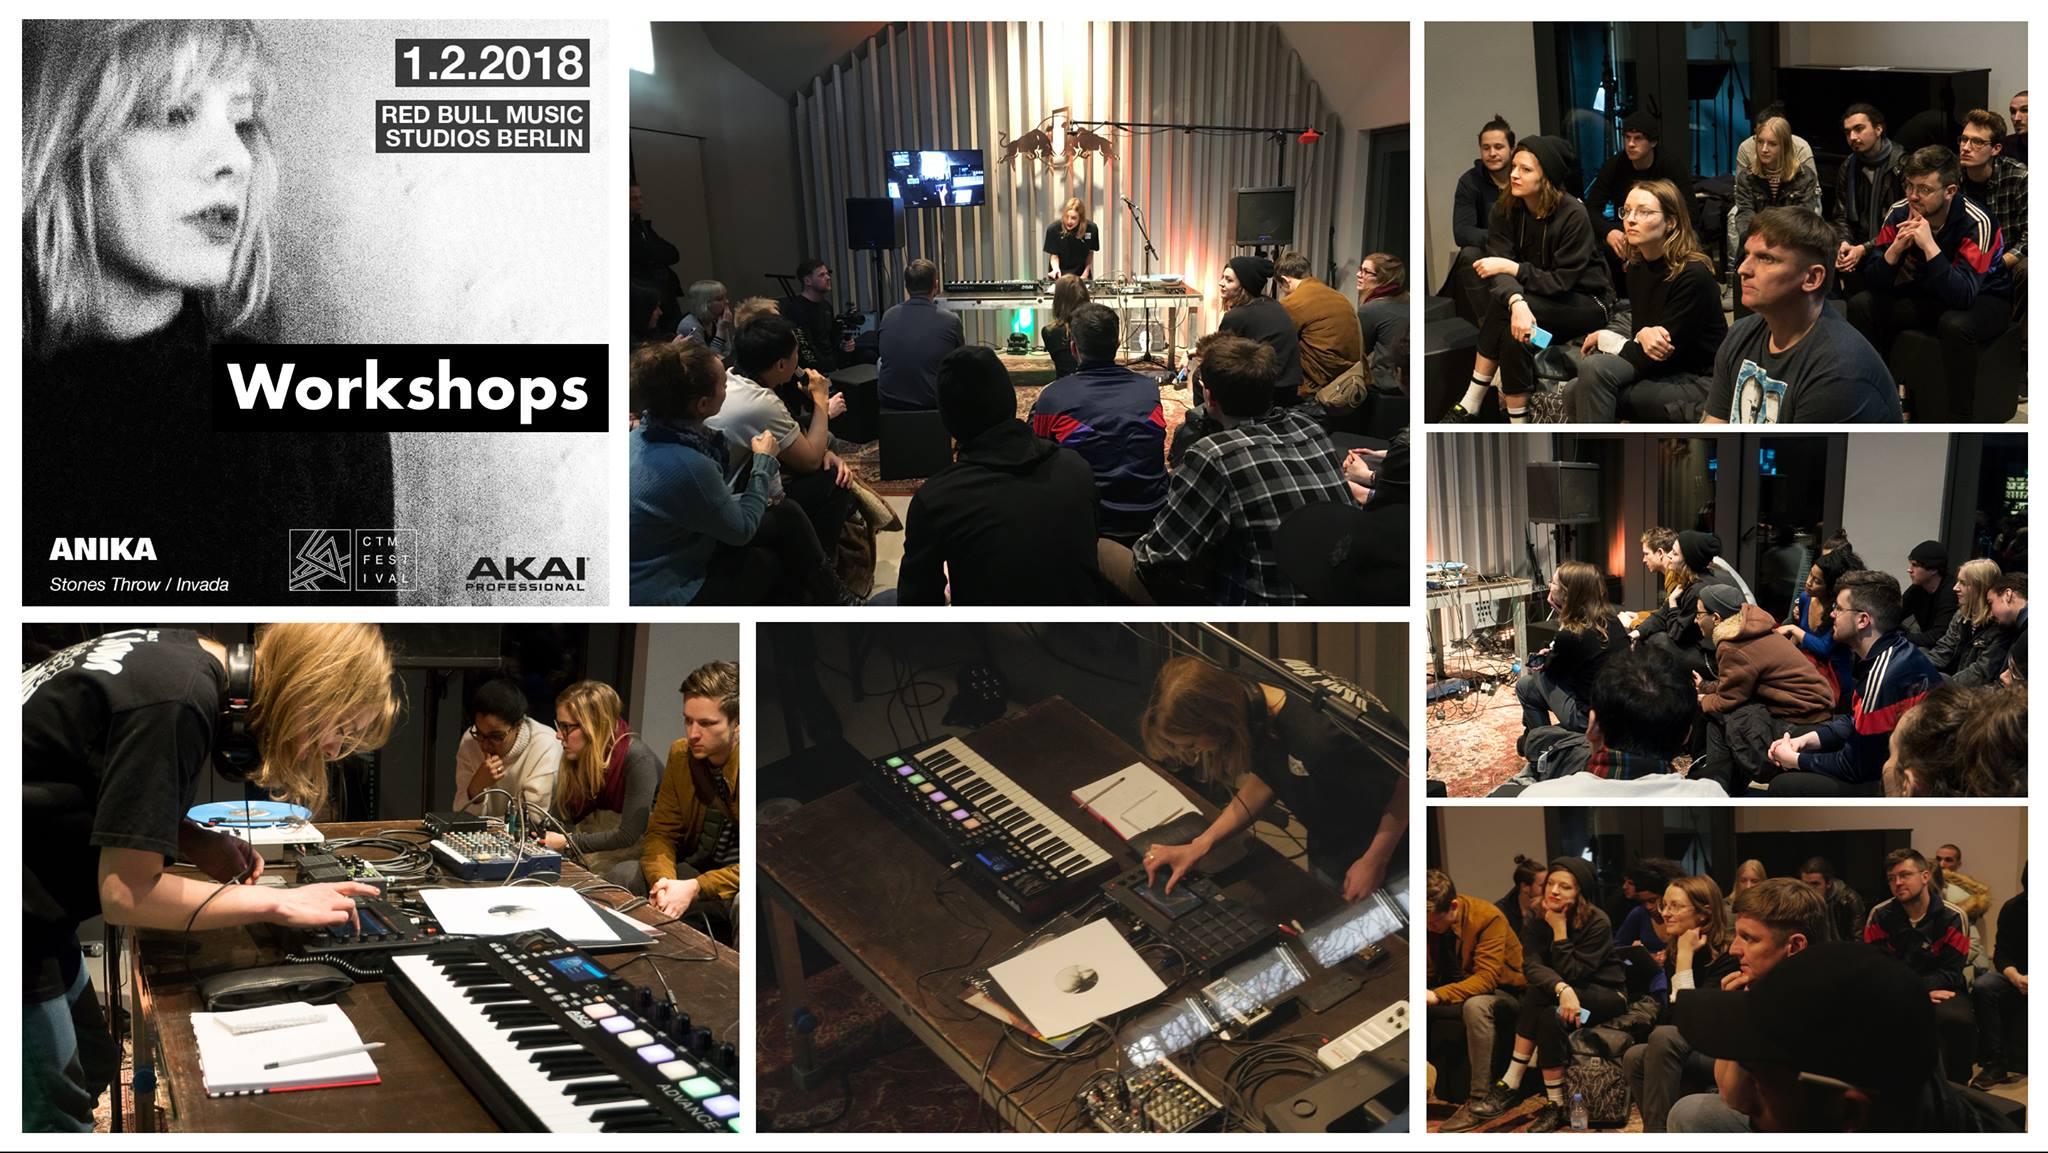 WORKSHOP:  Akai Pro #MPC Live workshop w/  Anika ( Stones Throw Records  /  Invada Records UK )